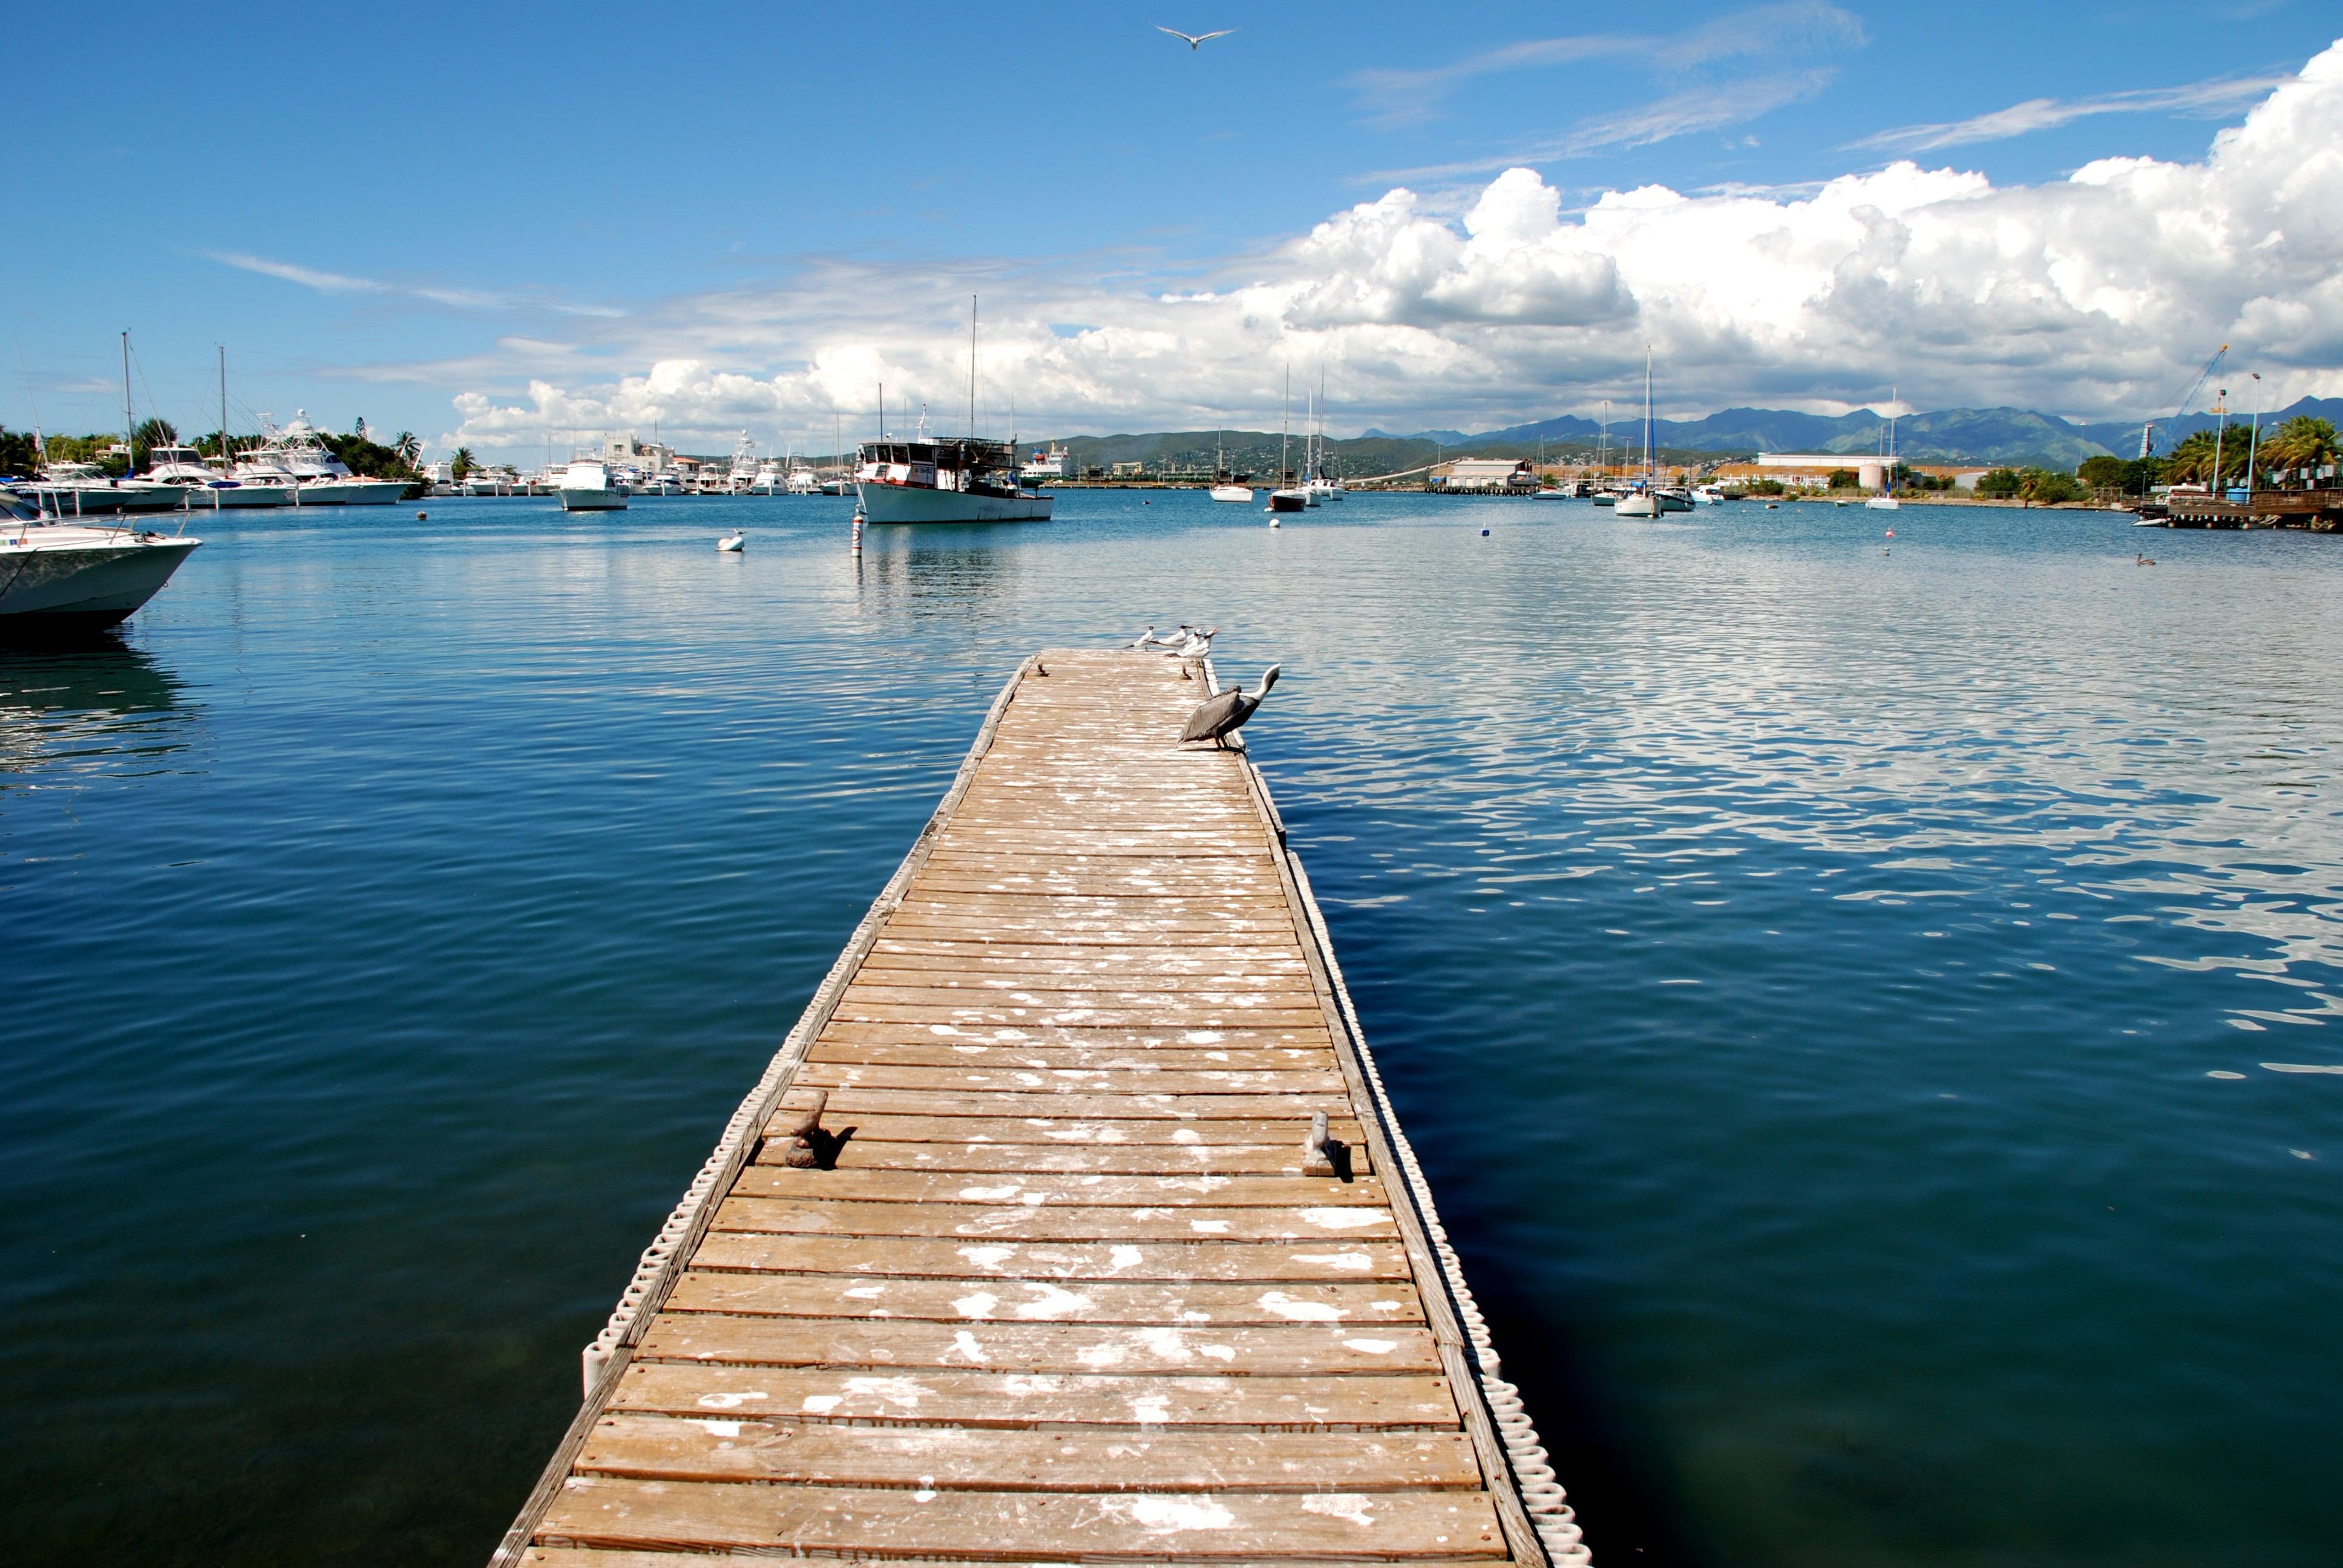 La Guancha Boardwalk is a top Puerto Rico landmark